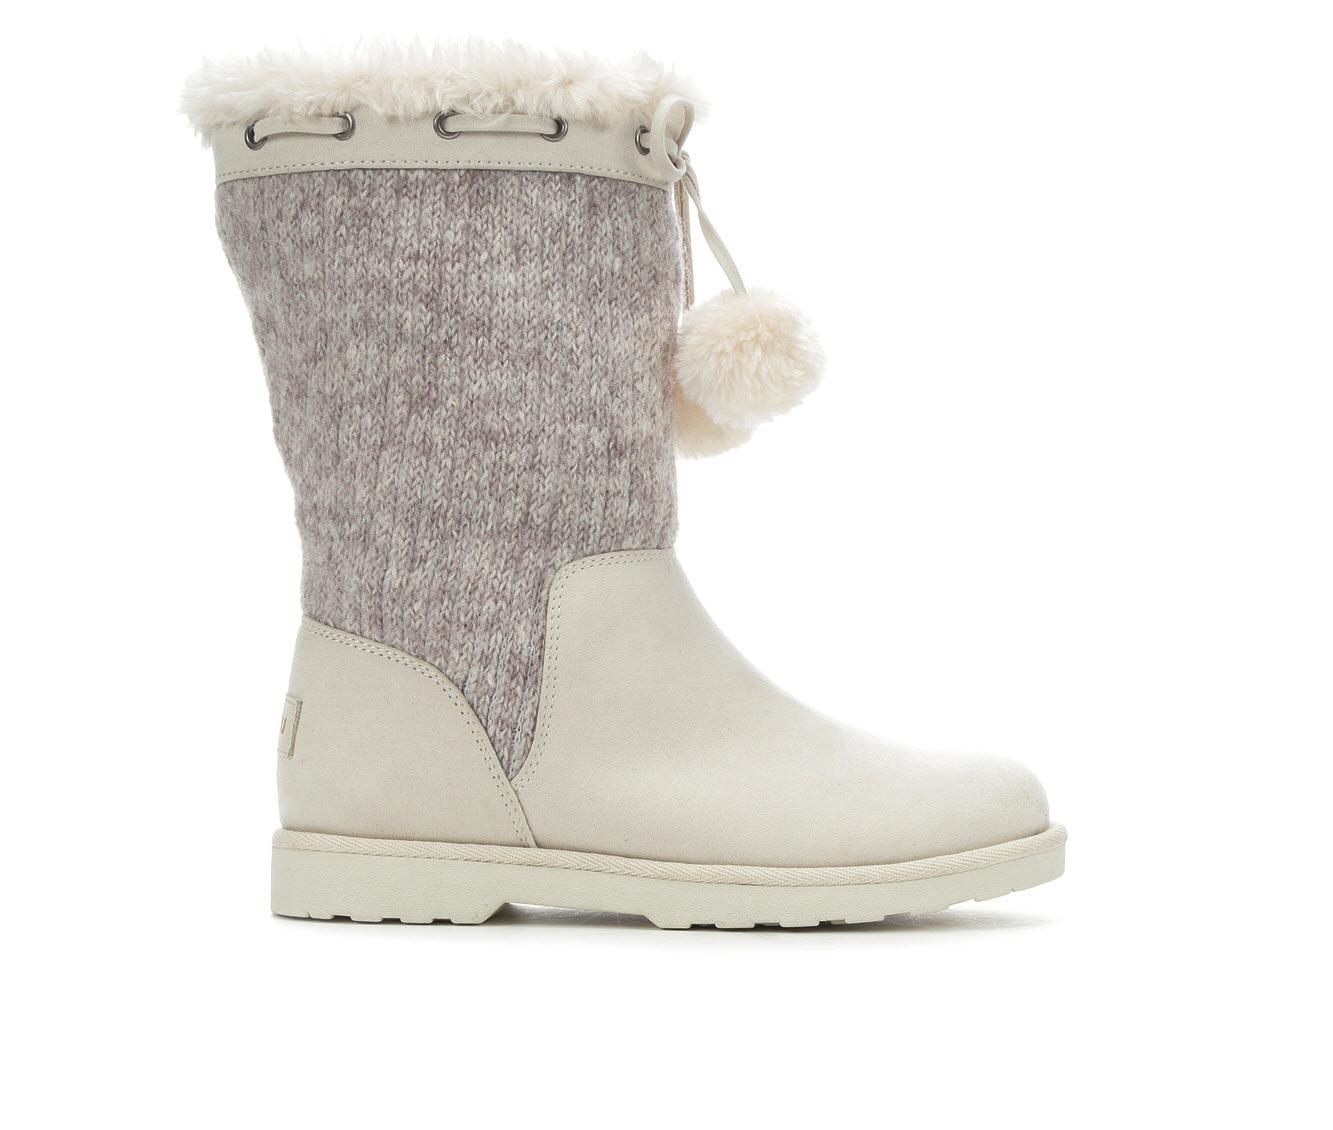 Makalu Mahal Women's Boot (White Canvas)